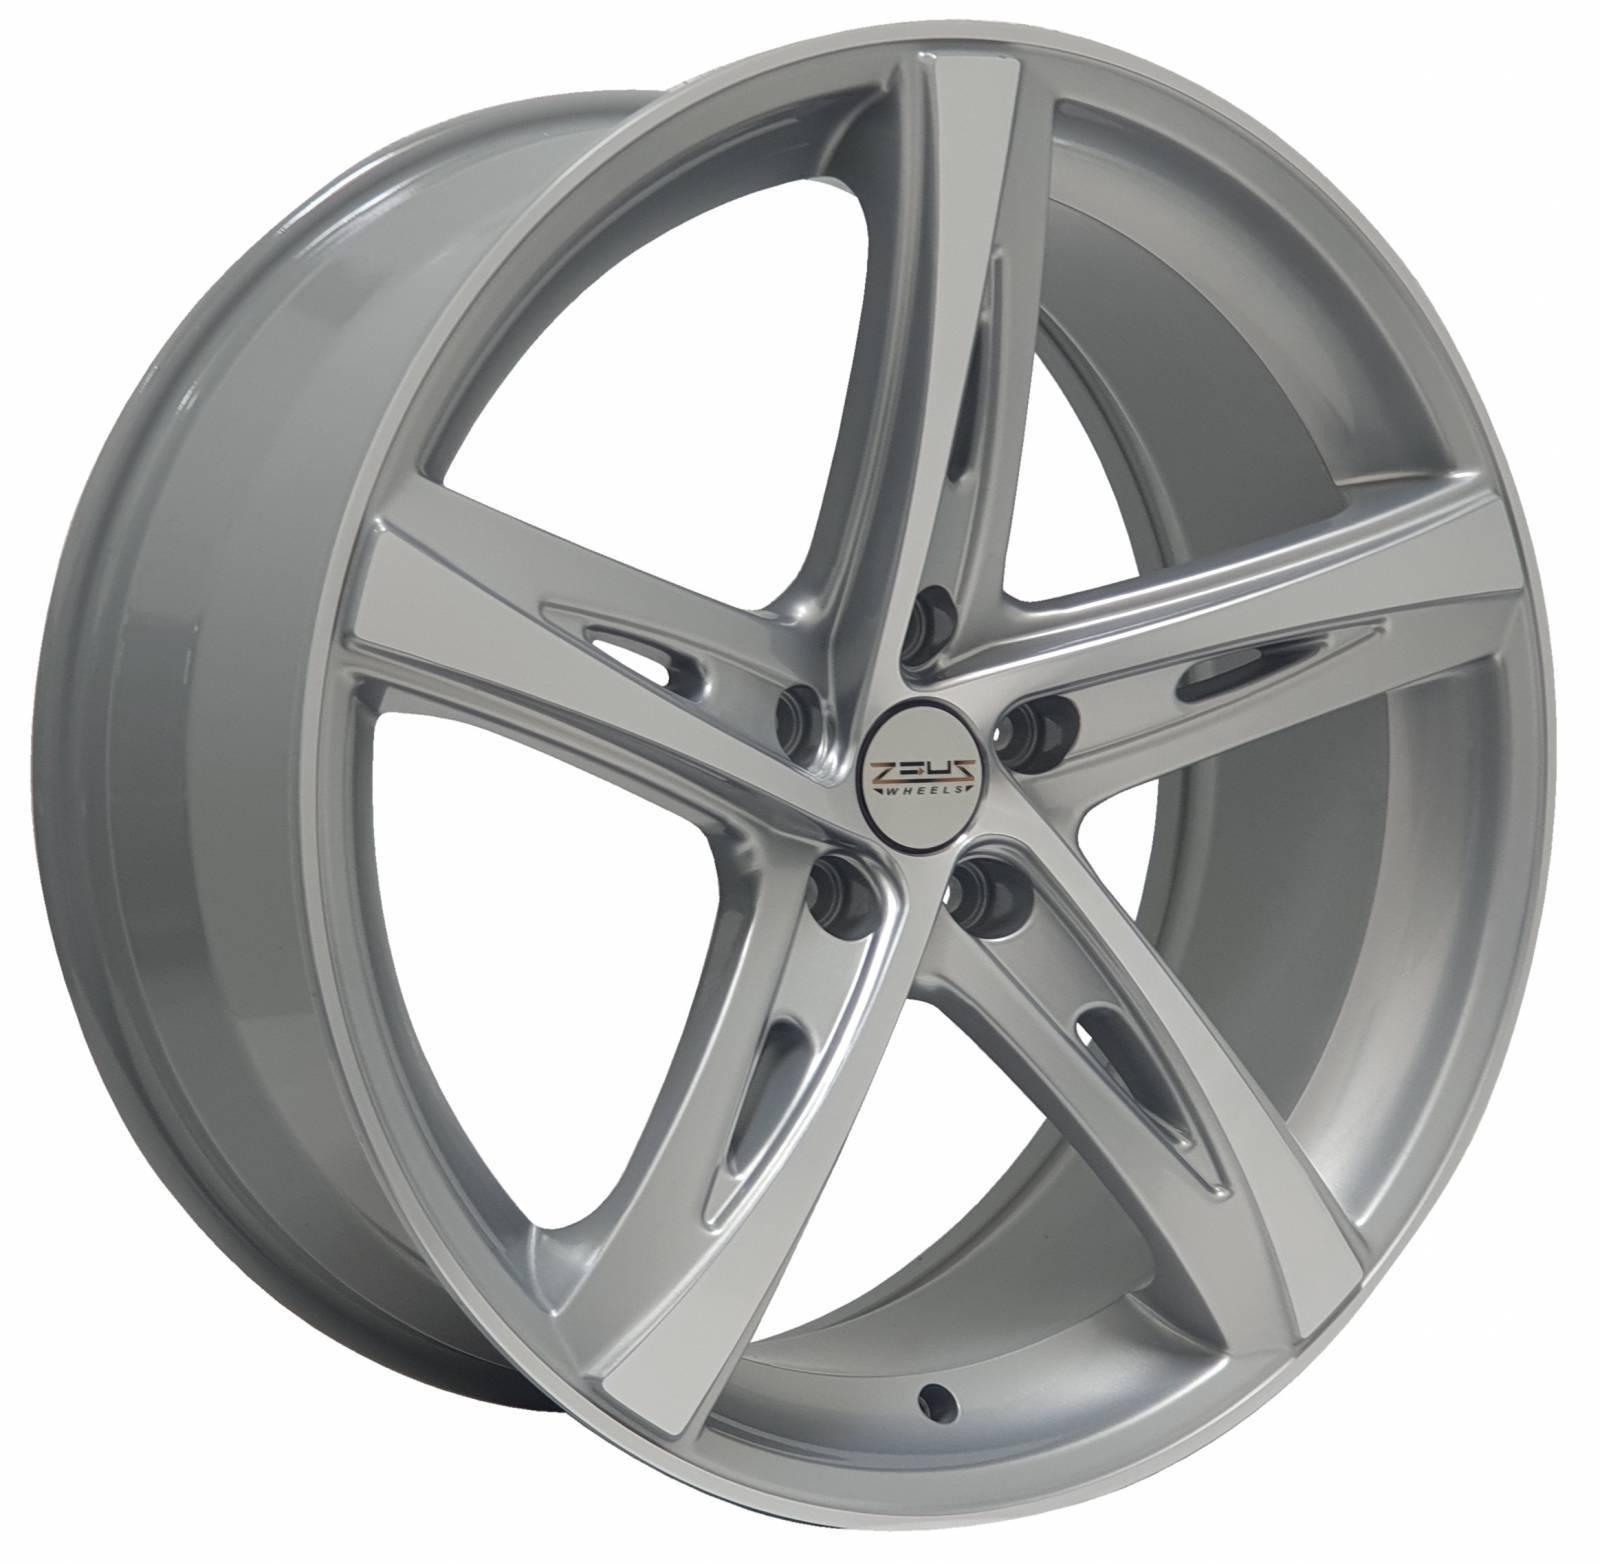 Jogo Rodas Volvo Monacco TIS 541 MW110 Aro 20 5x113 Prata Diamantado